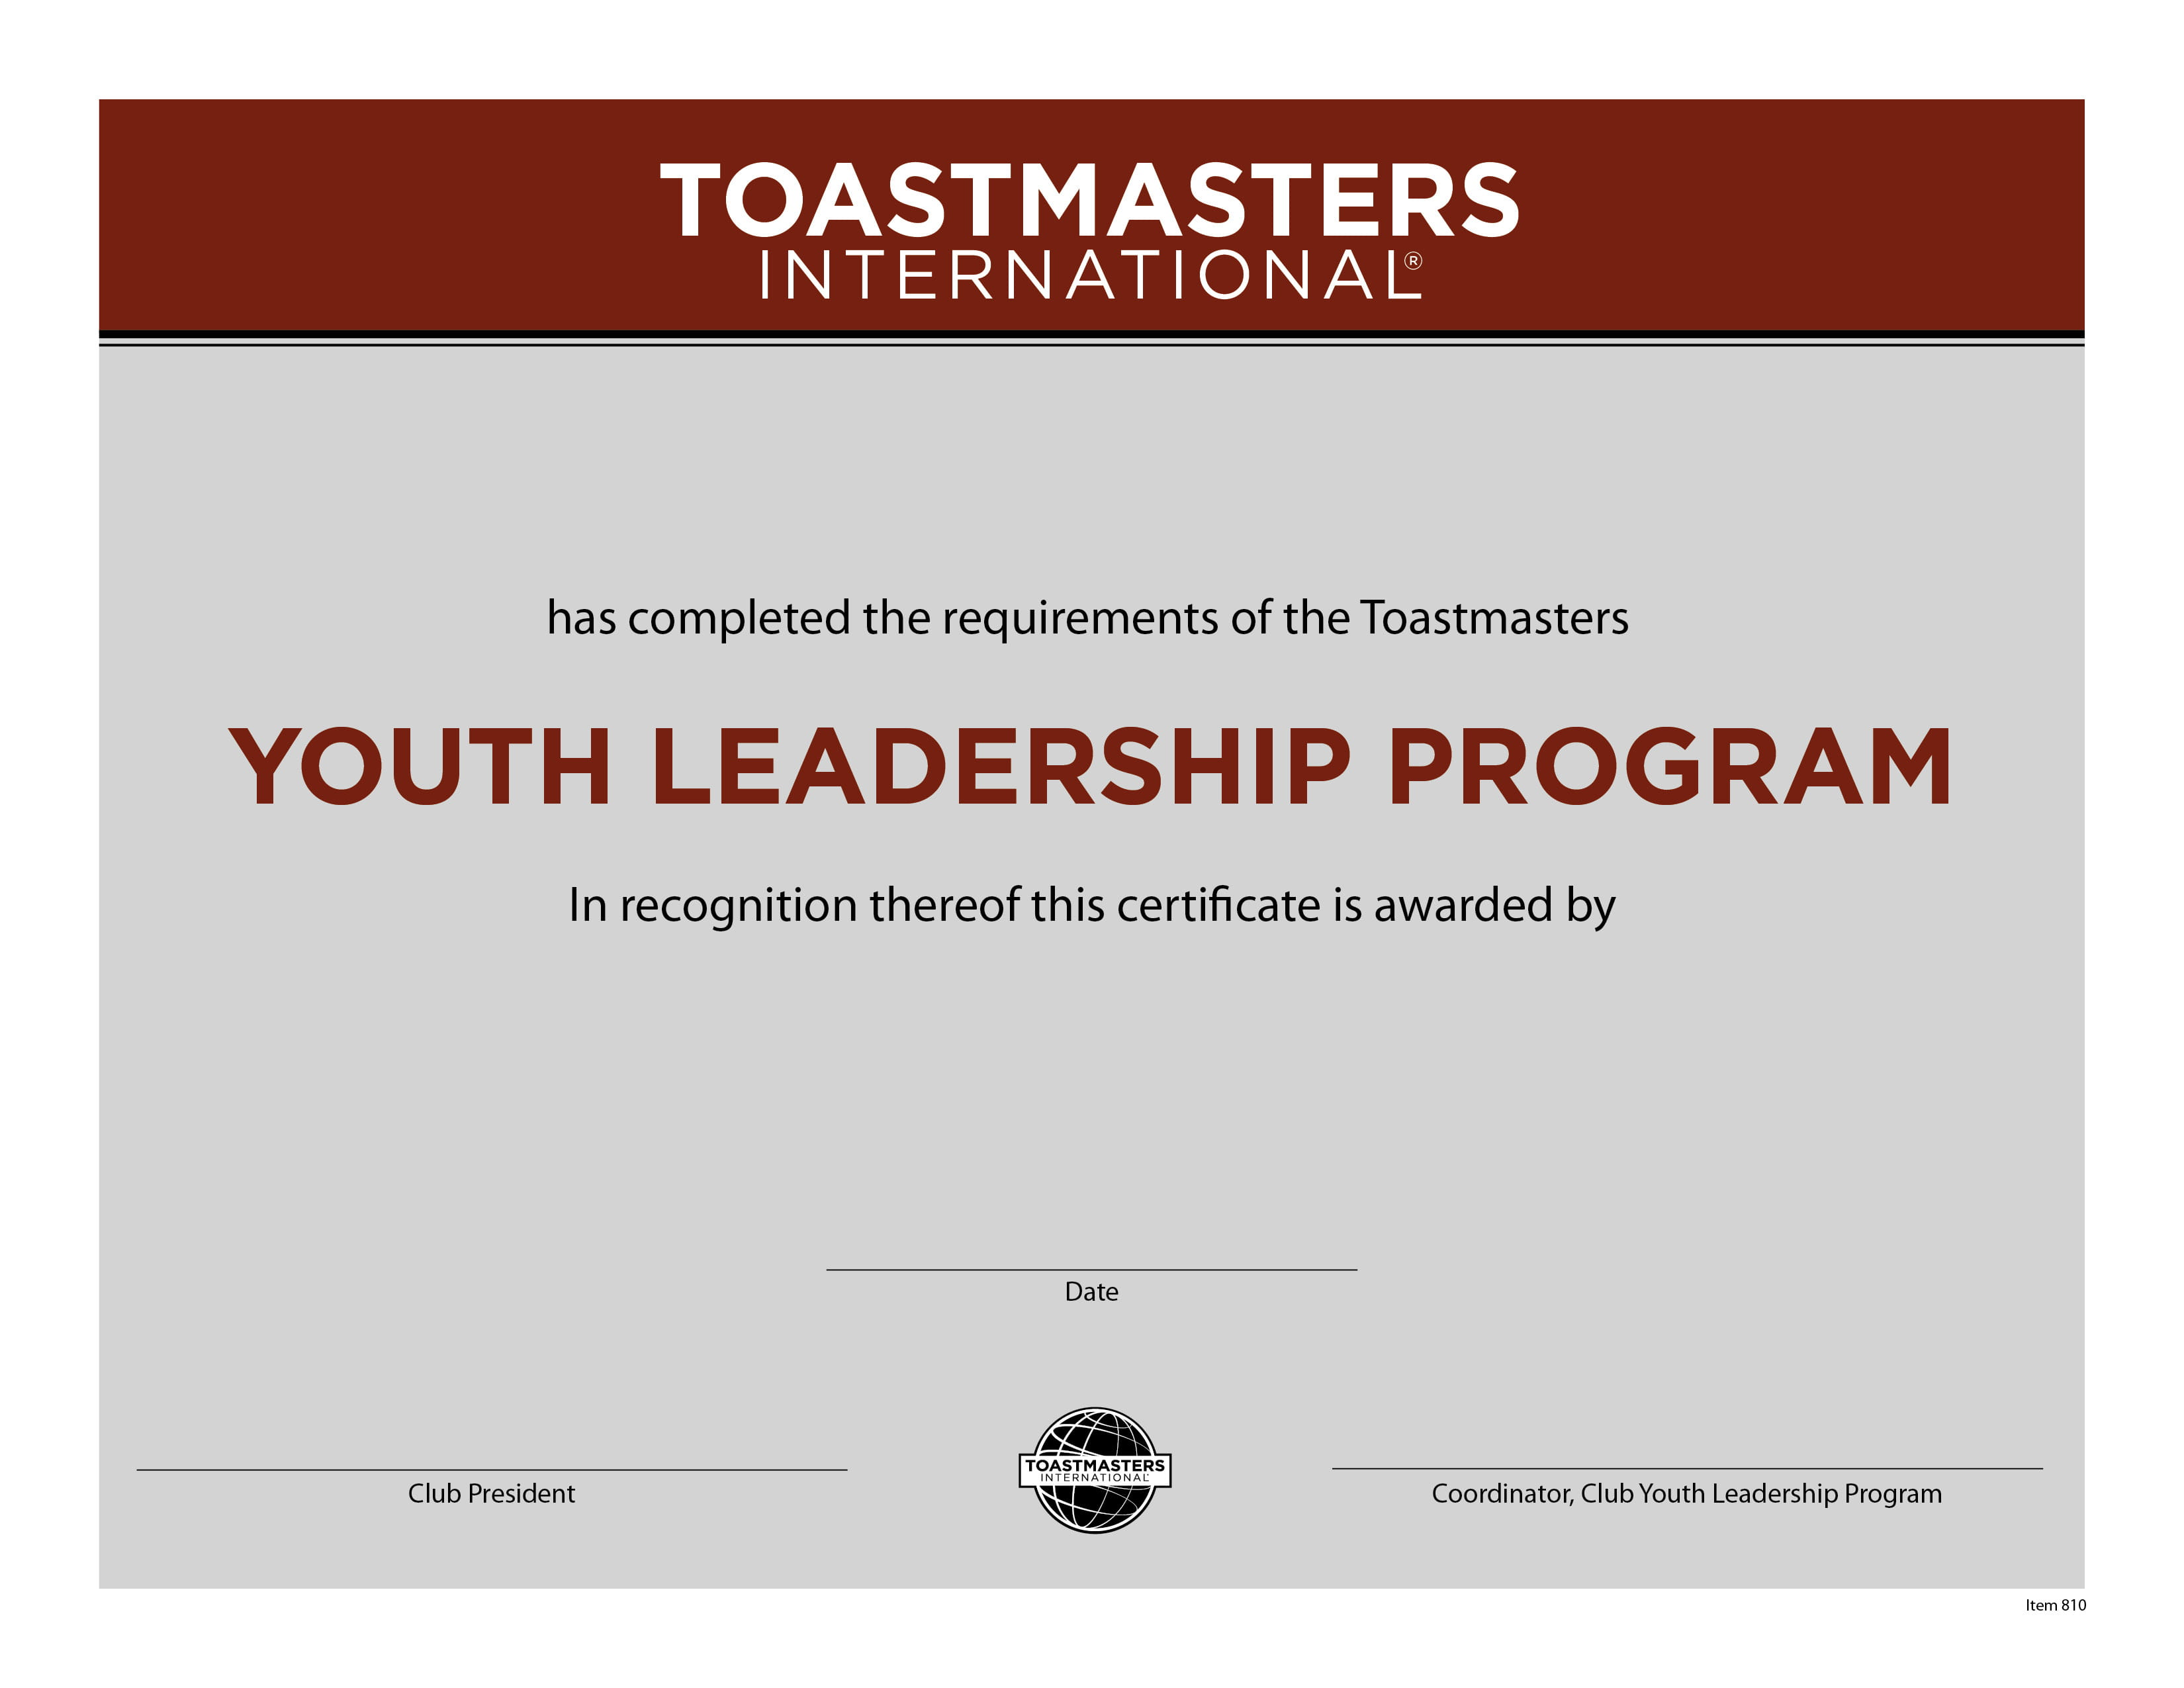 Youth leadership completion certificate altavistaventures Images